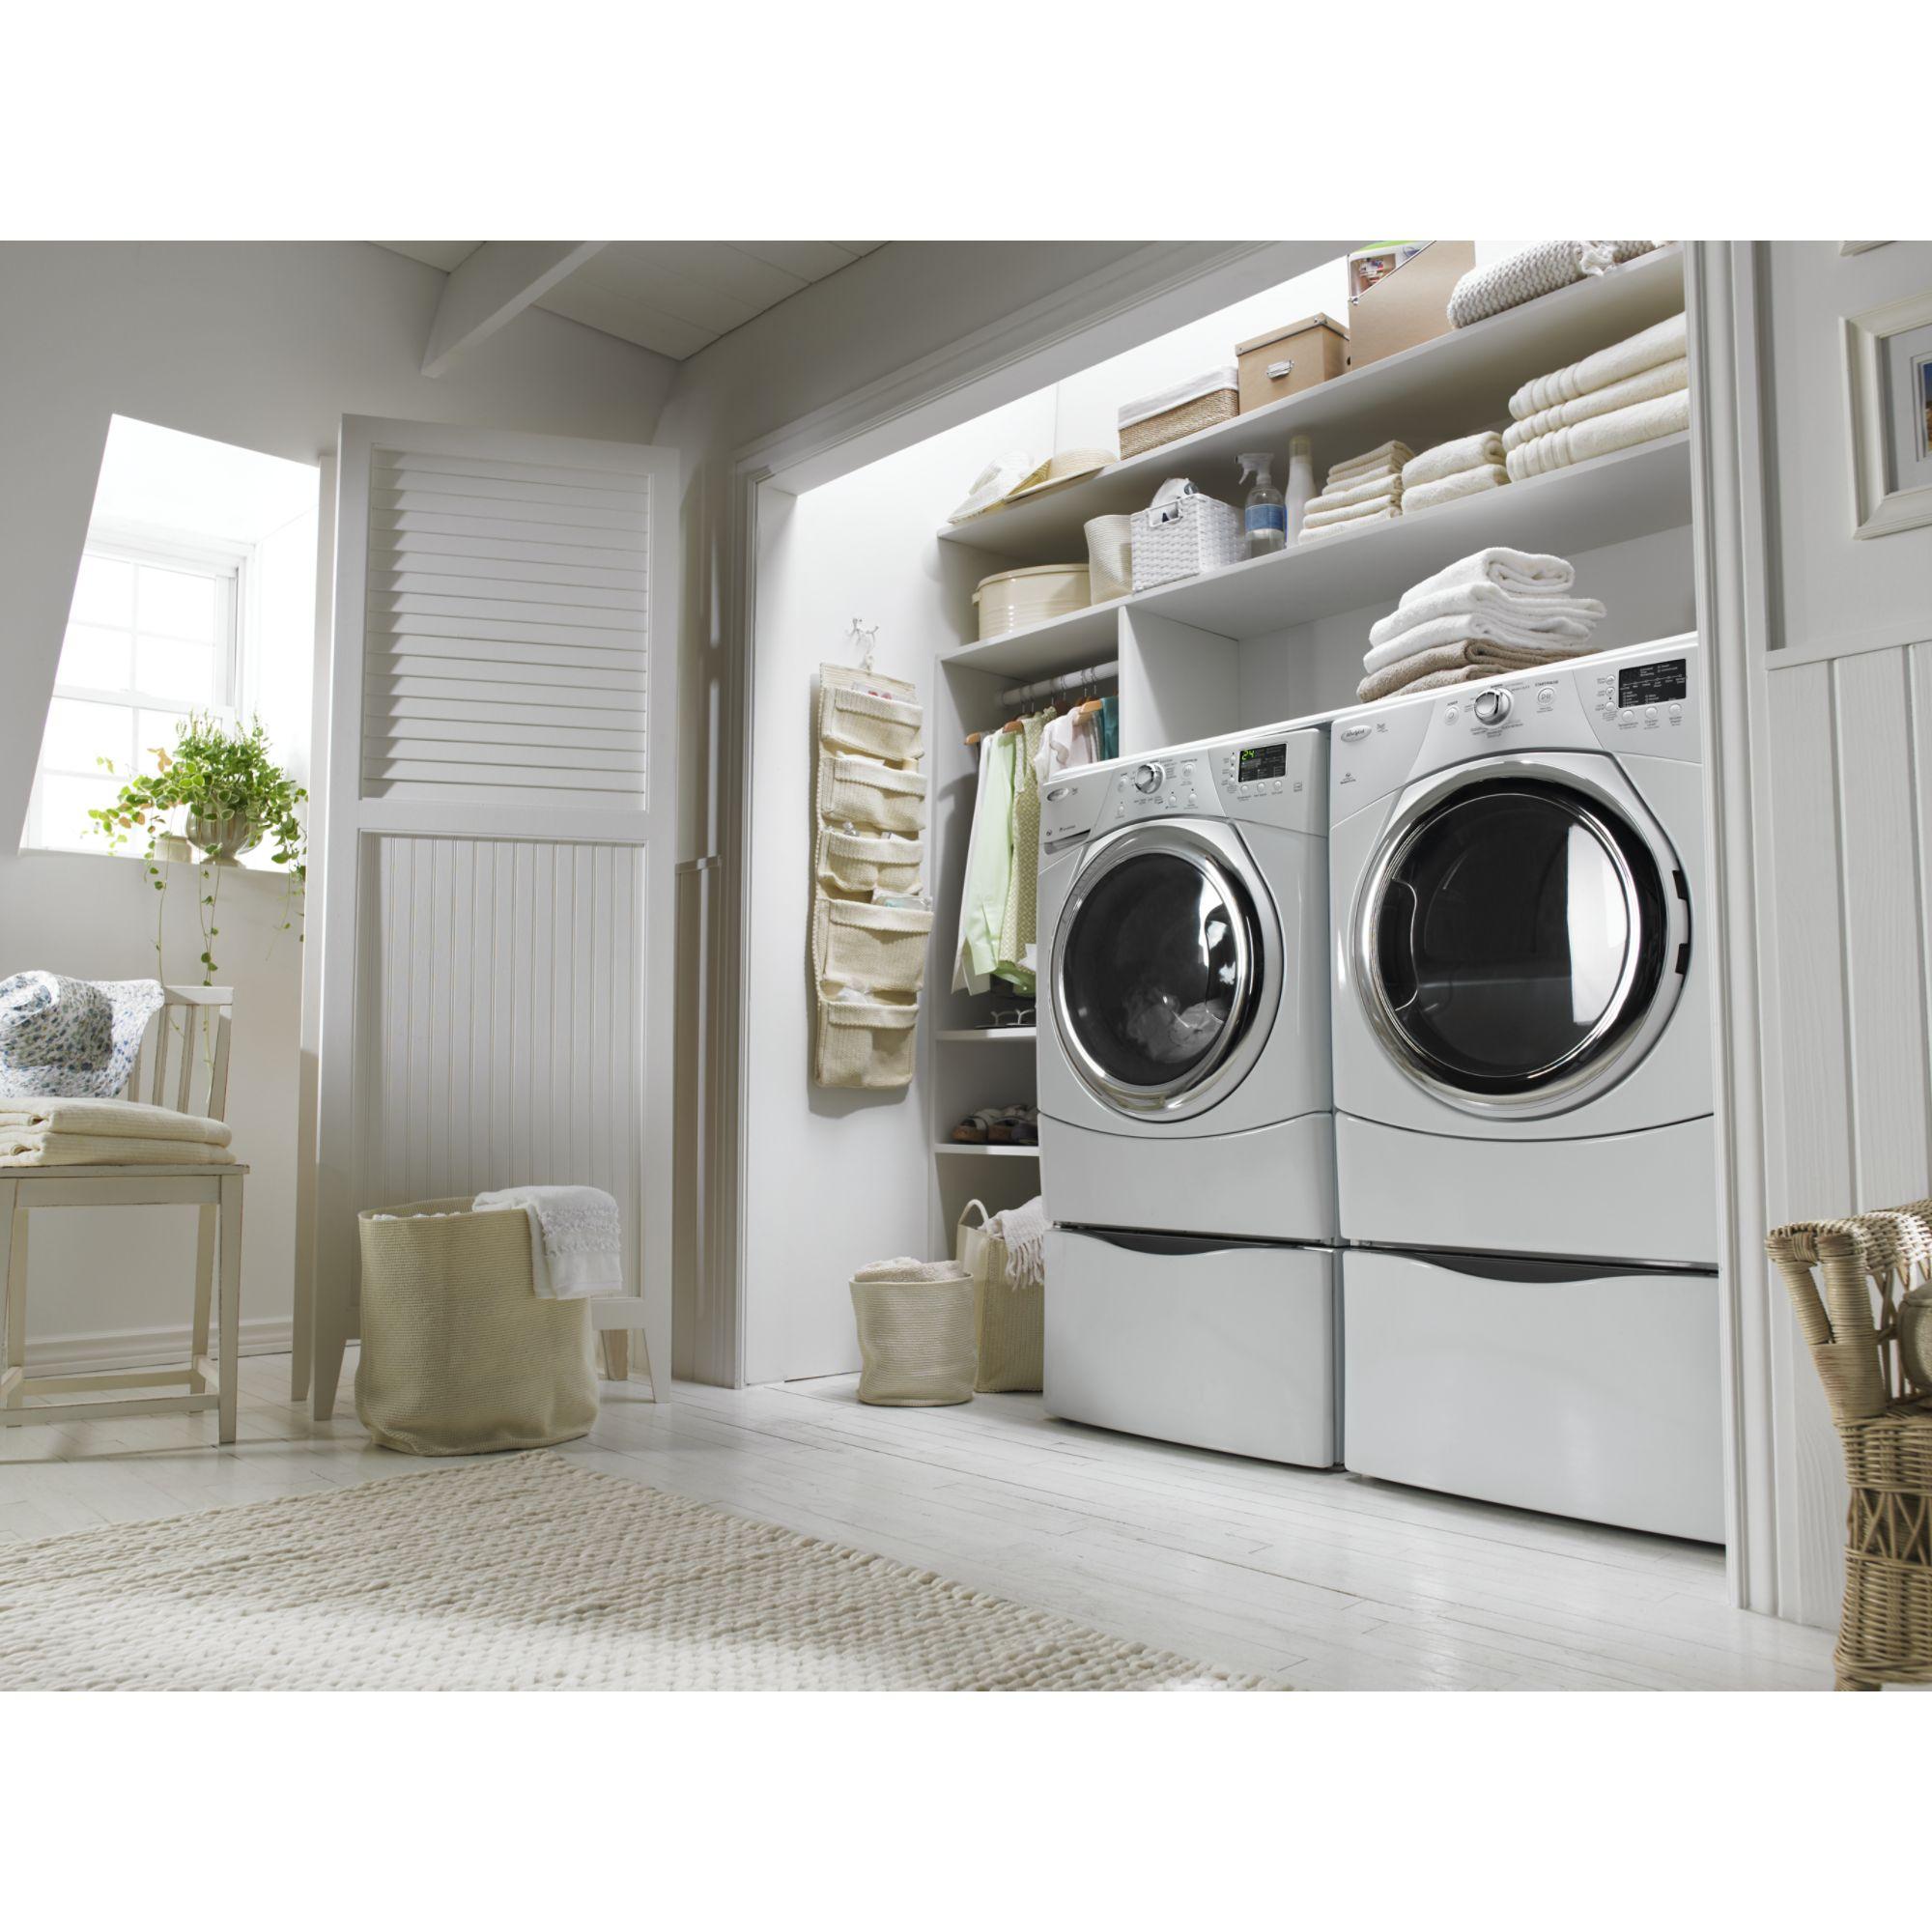 Whirlpool 6.7 cu. ft. Steam Gas Dryer  - White